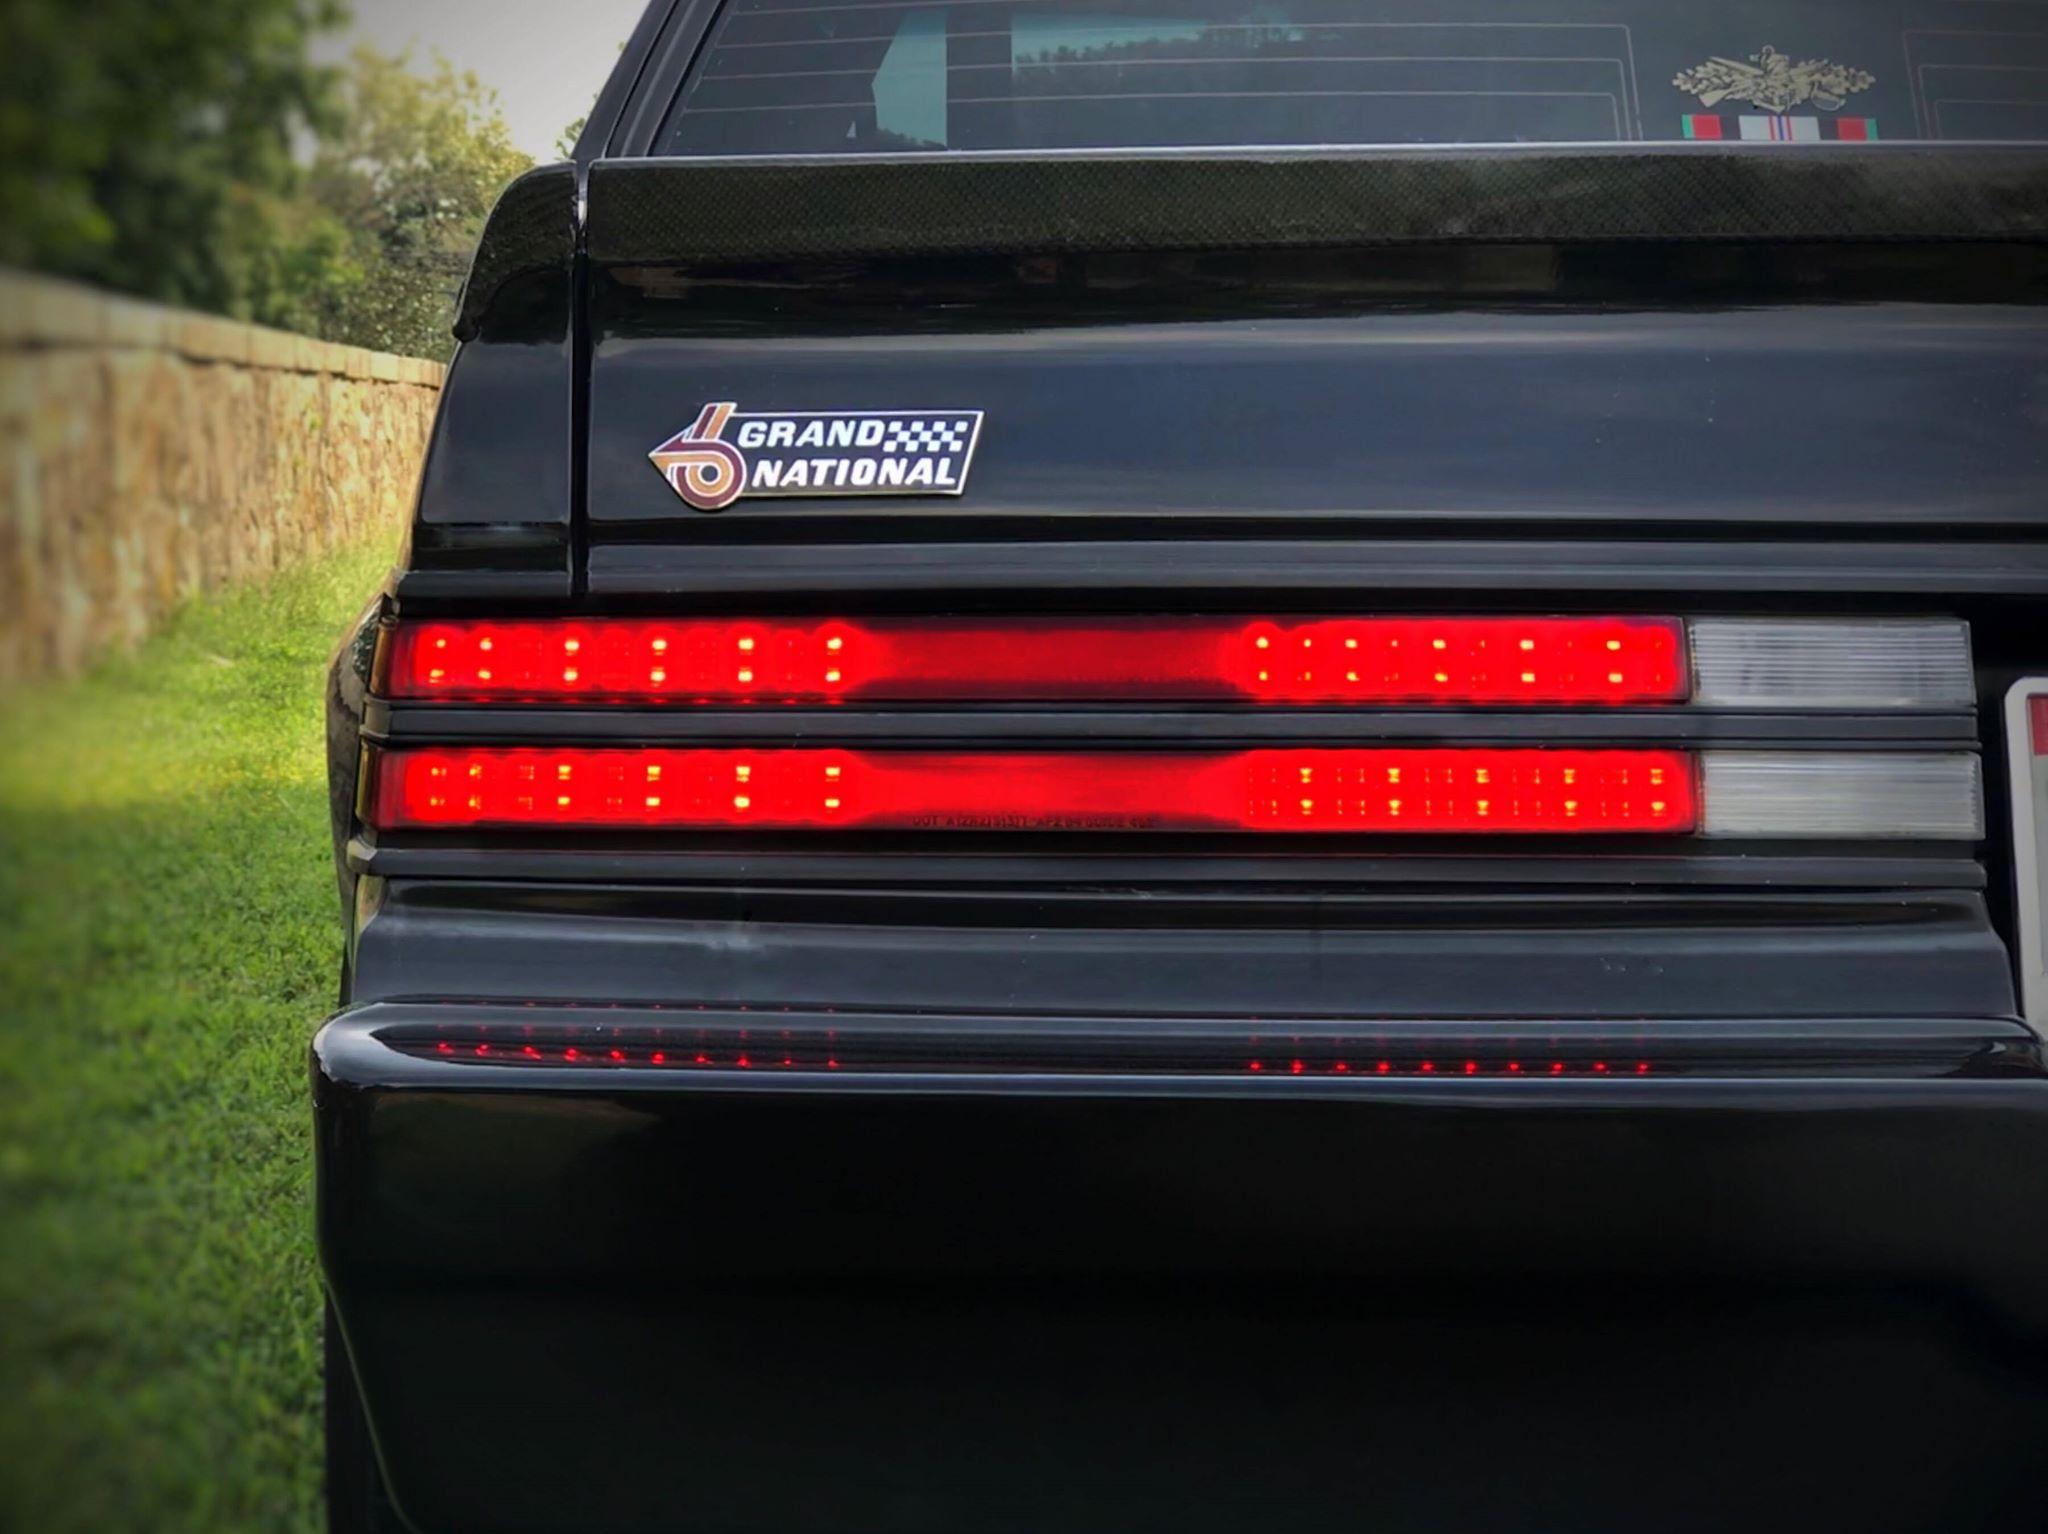 1983 1987 Buick Regal Grand National Digital Tail Light Panels